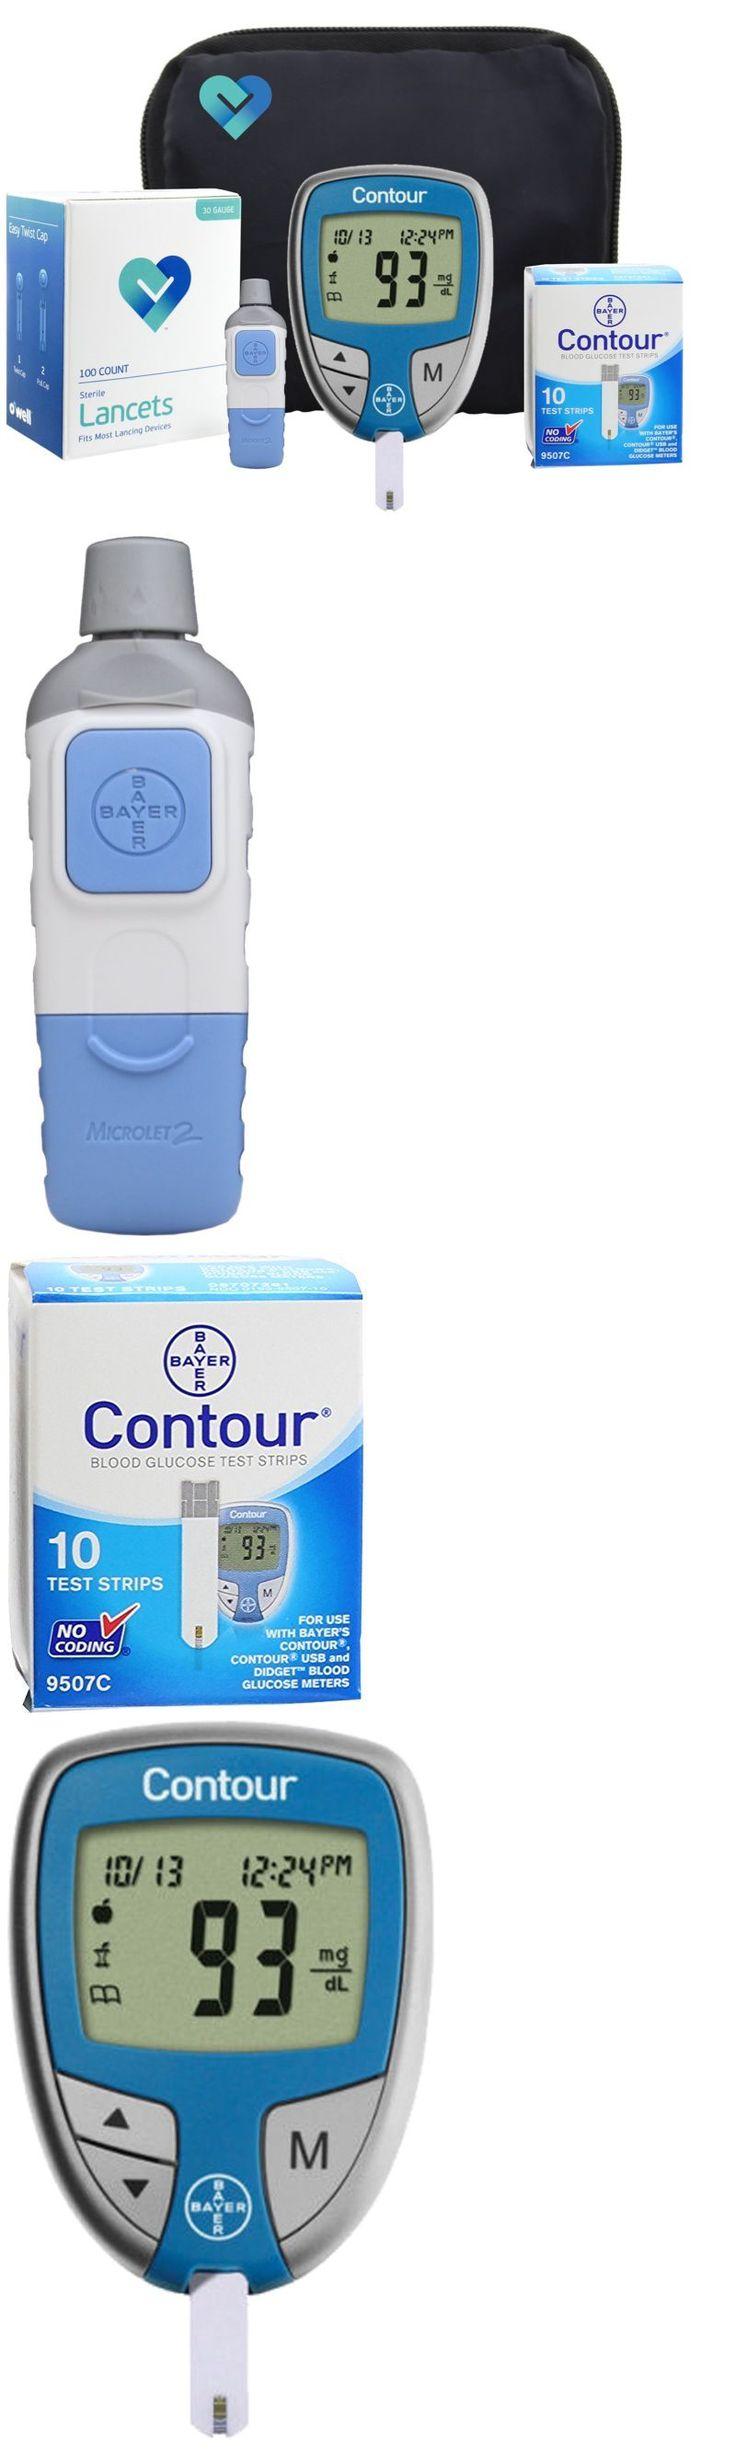 Monitoring Kits: Diabetes Test Kit Tester Diabetic Test Strips Blood Sugar Glucose Meter Machine -> BUY IT NOW ONLY: $36.08 on eBay!